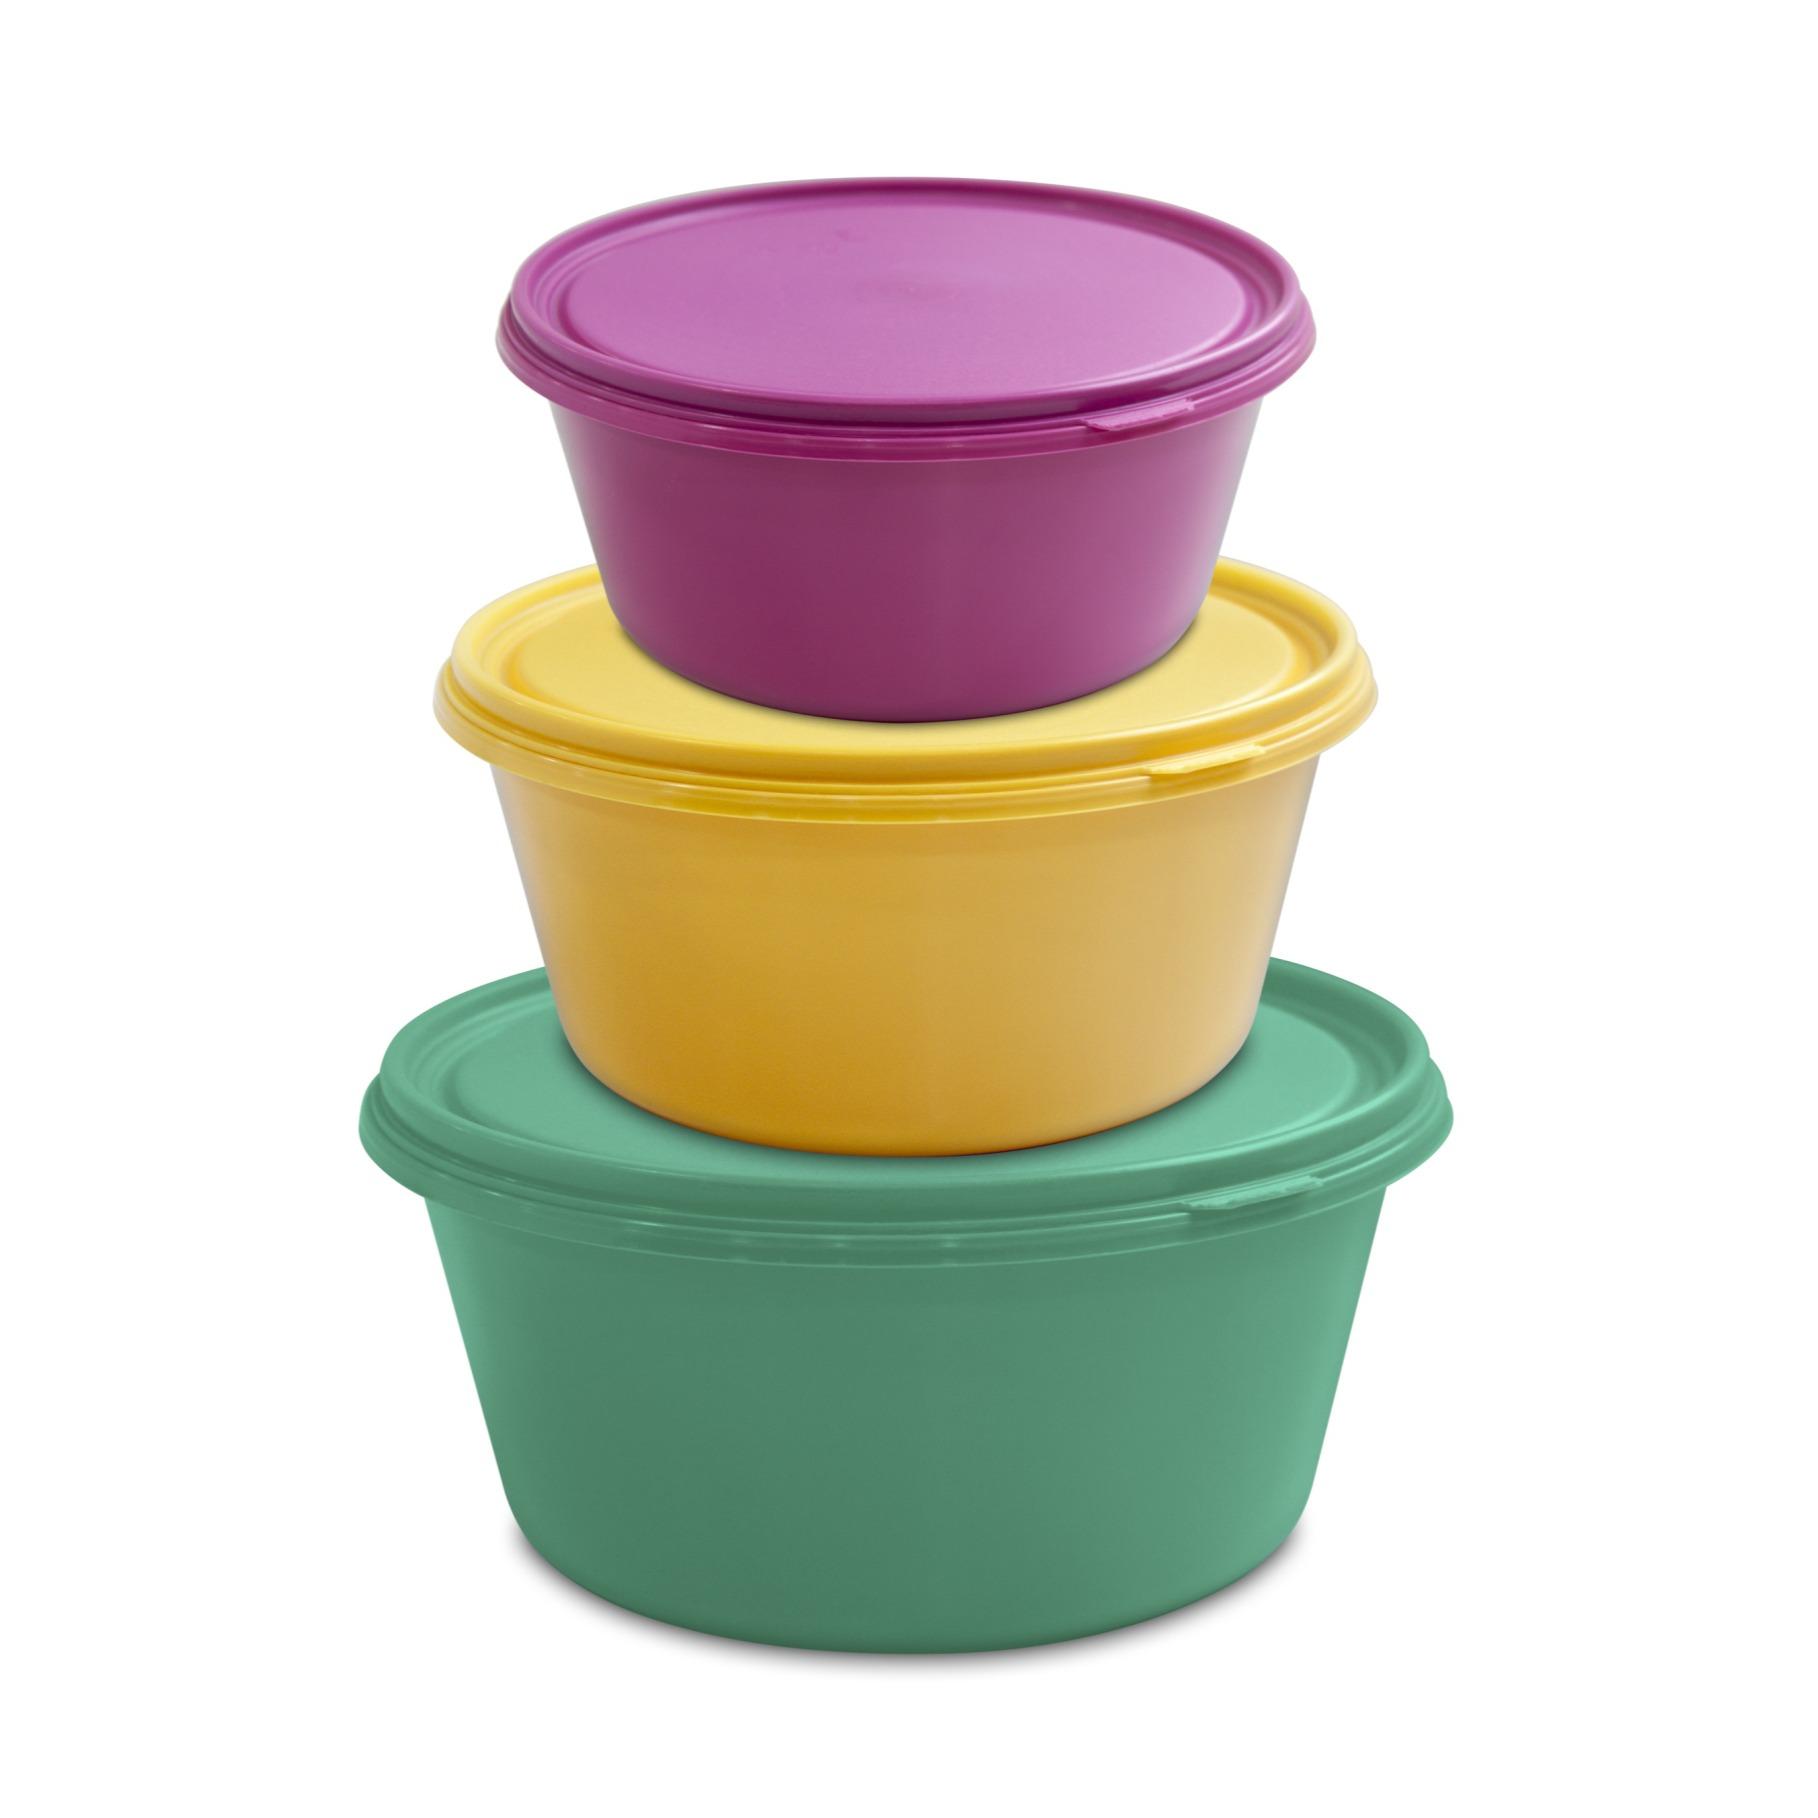 Jogo de Potes Plasticos Redondo 3 Pecas 1411 - Plasvale